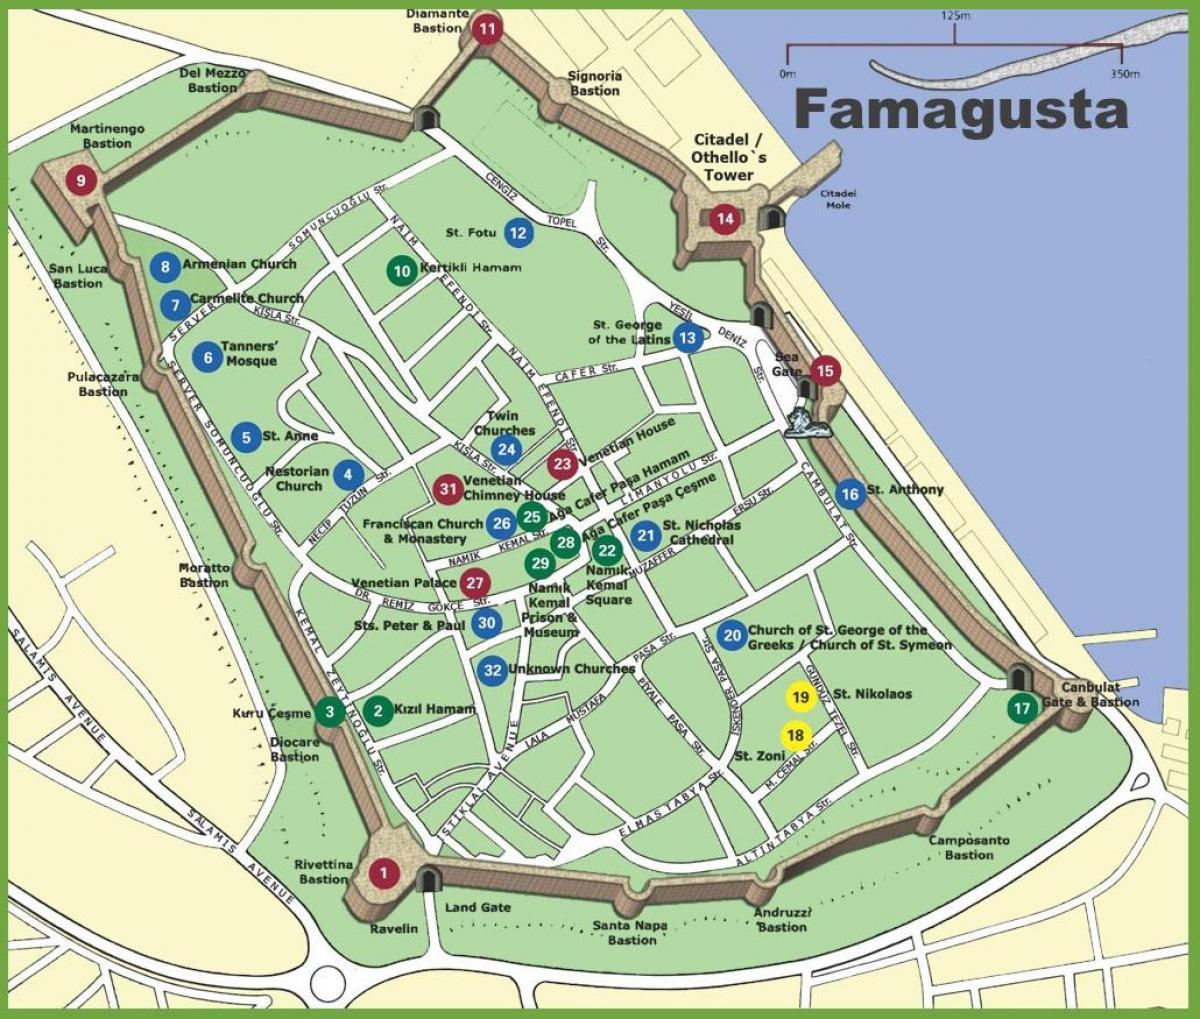 Karta Famagusta Cypern.Famagusta Pa Cypern Karta Karta Over Famagusta Norra Cypern Sodra